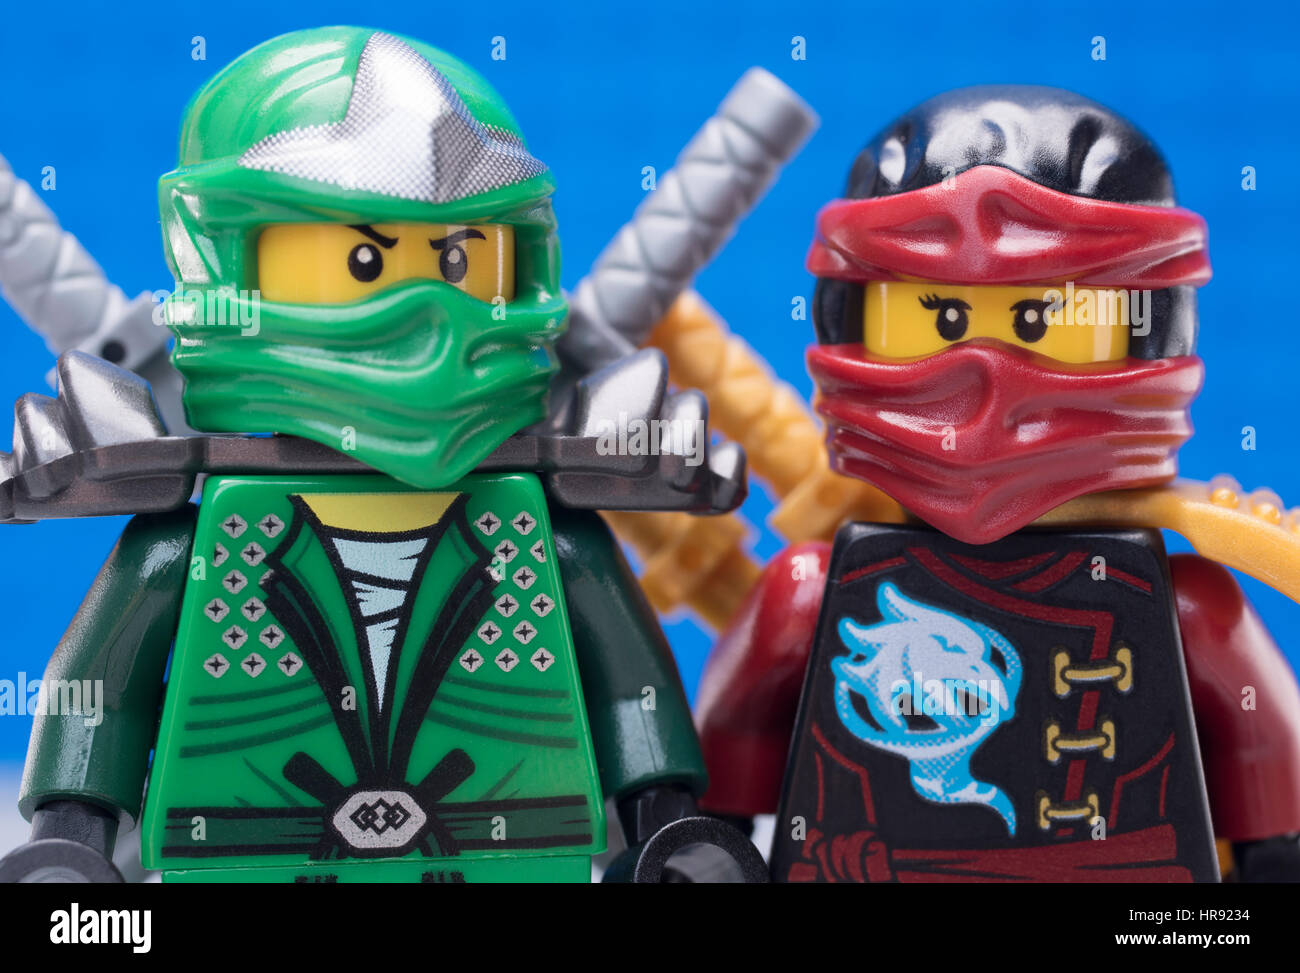 Lego Ninjago Stock Photos & Lego Ninjago Stock Images - Alamy